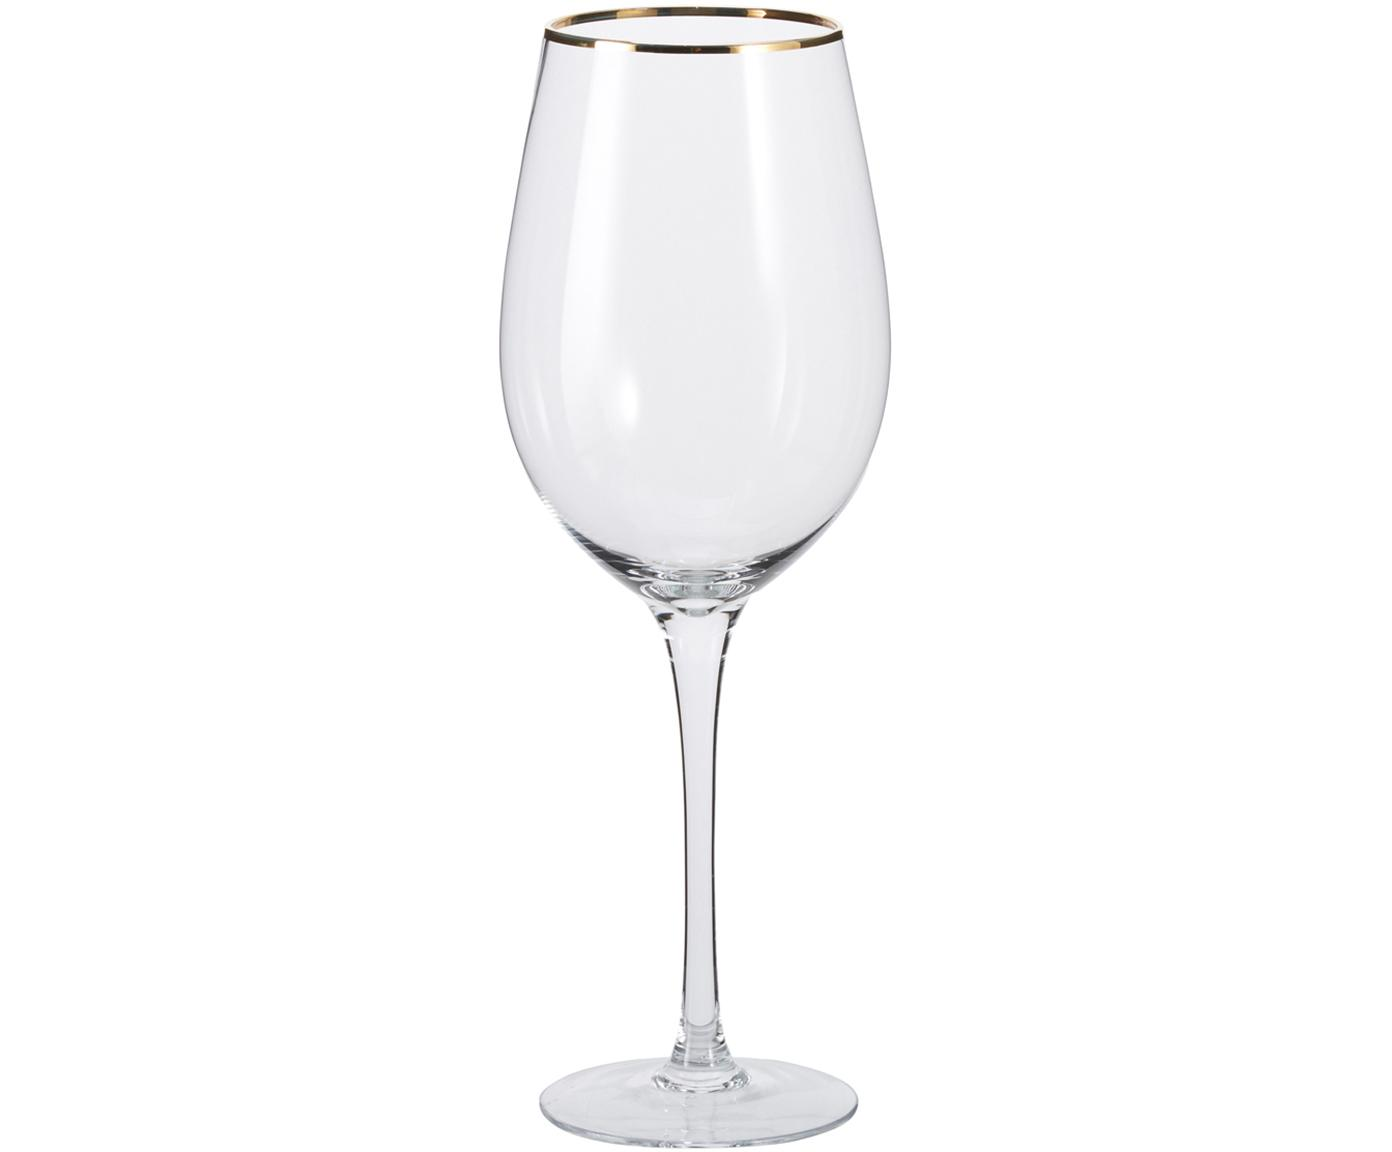 Copas de vino Chloe, 4uds., Vidrio, Transparente, Ø 9 x Al 26 cm